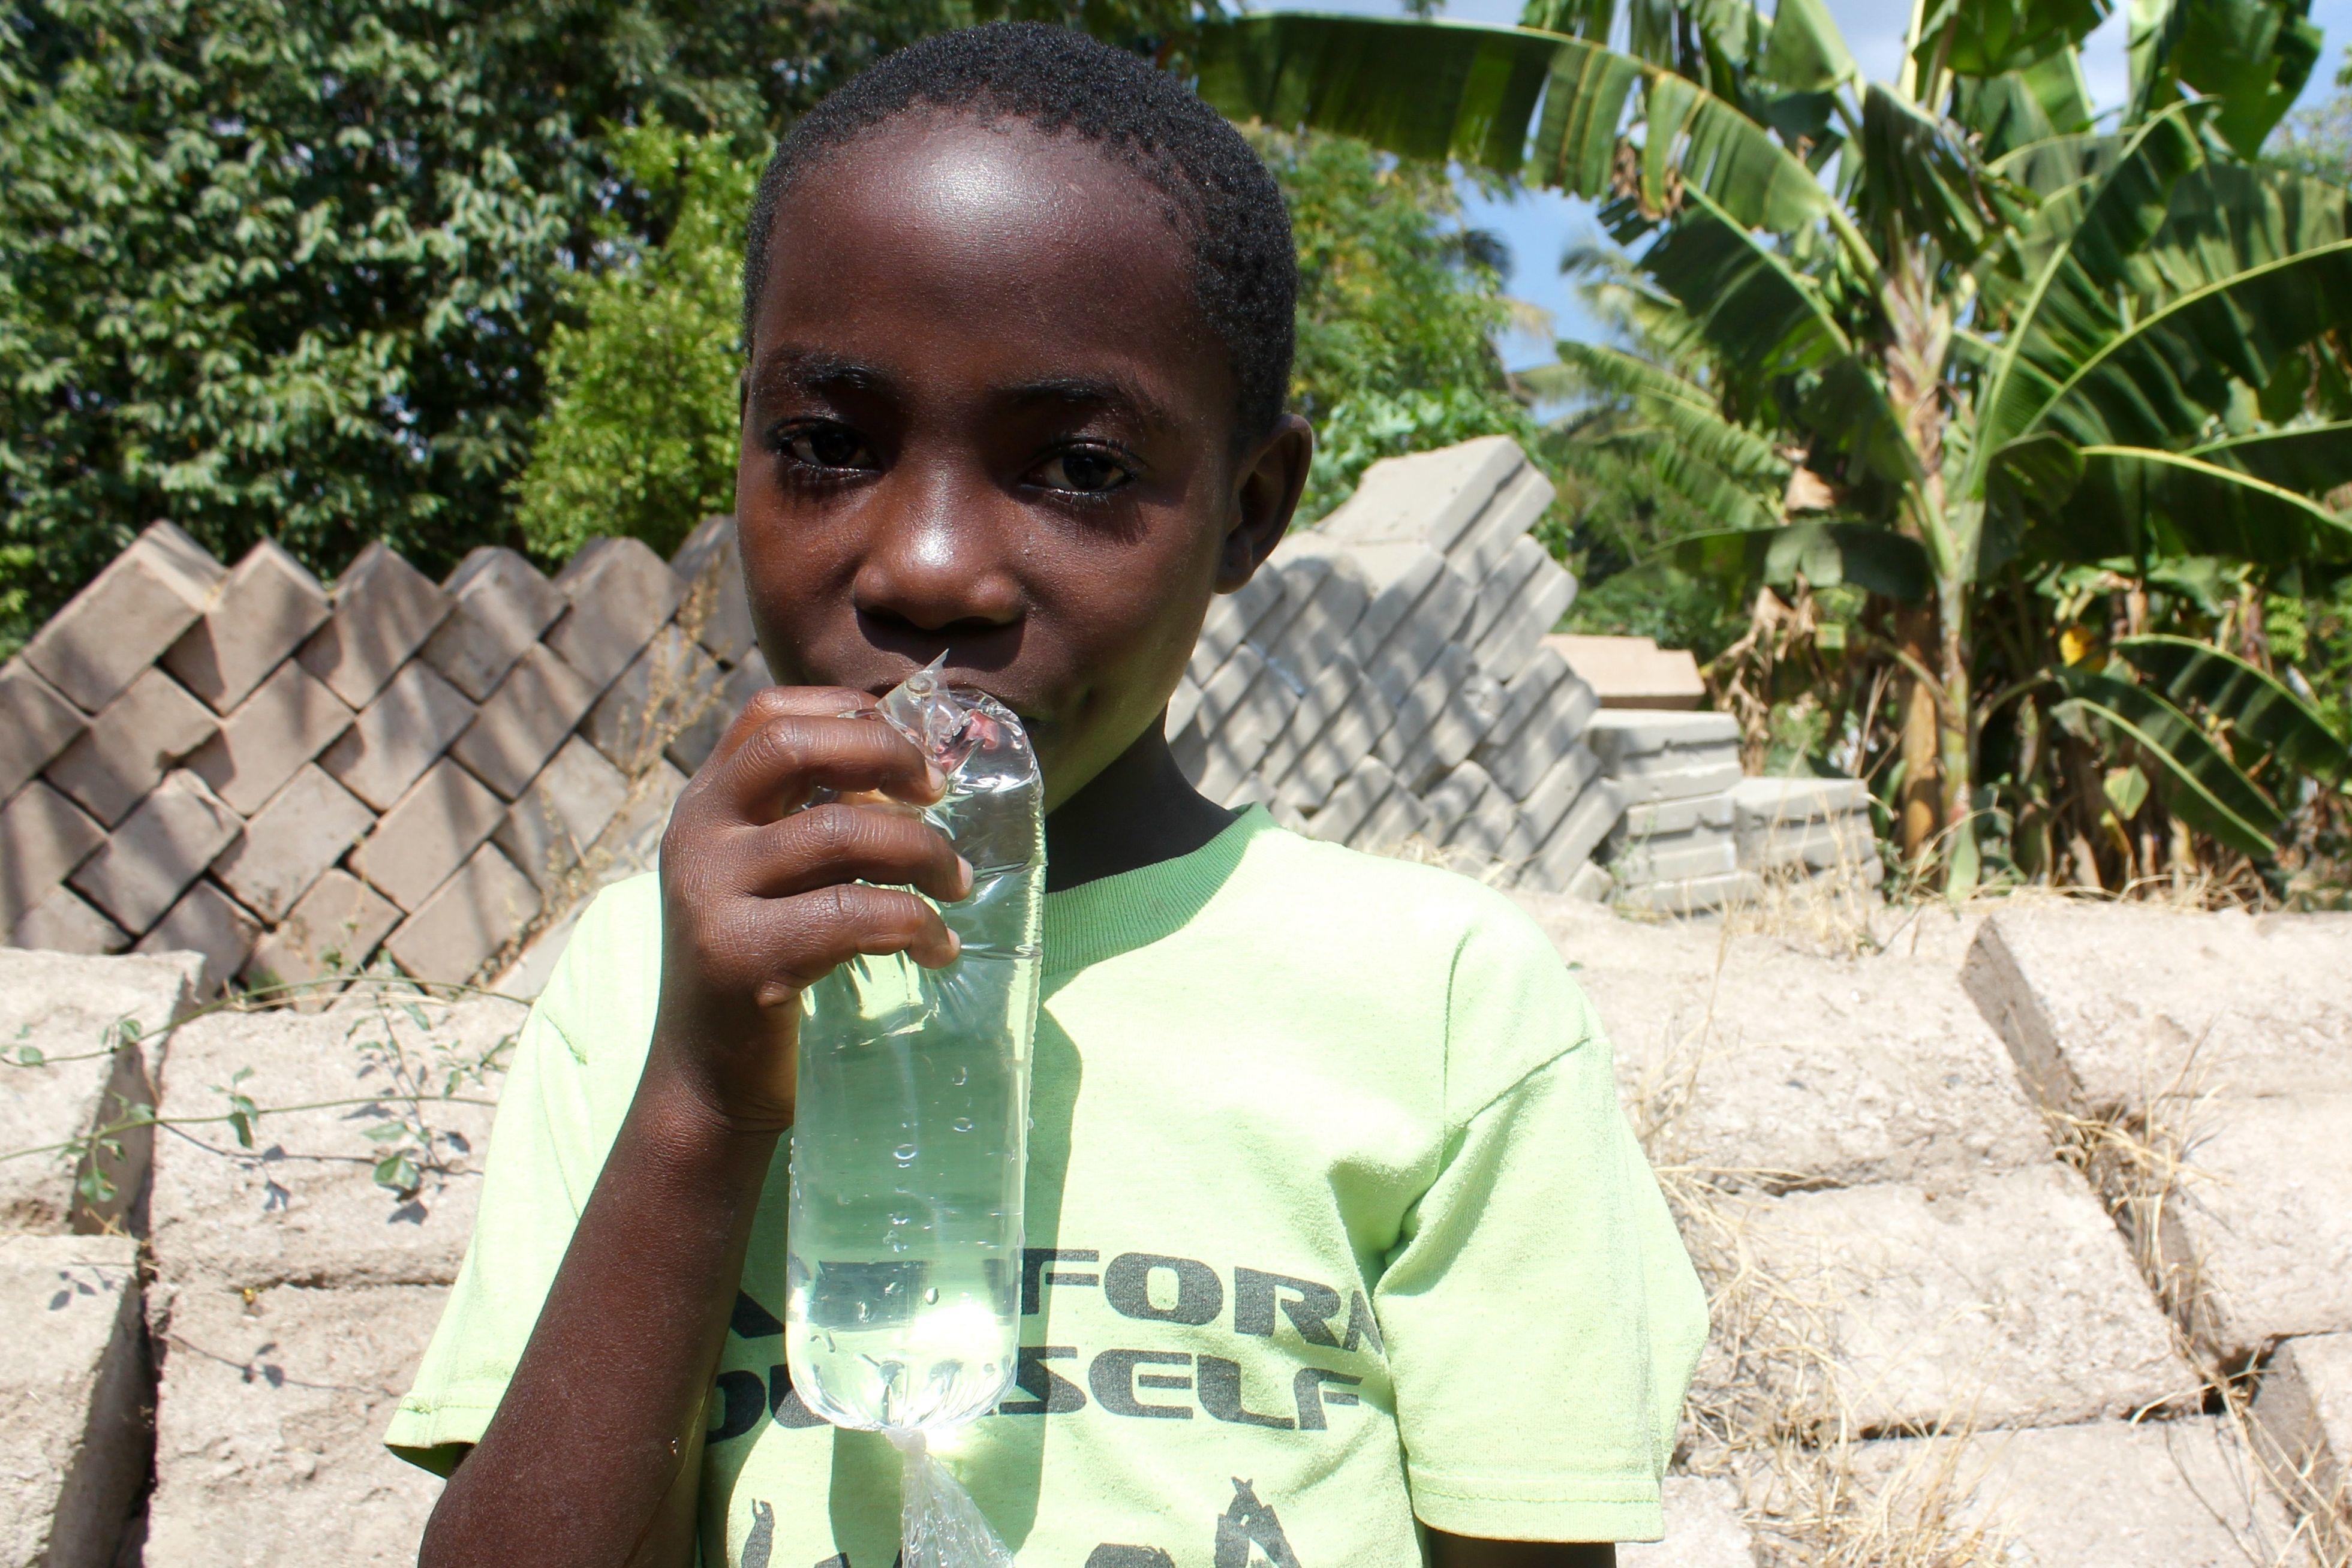 Water Safety & Wellness